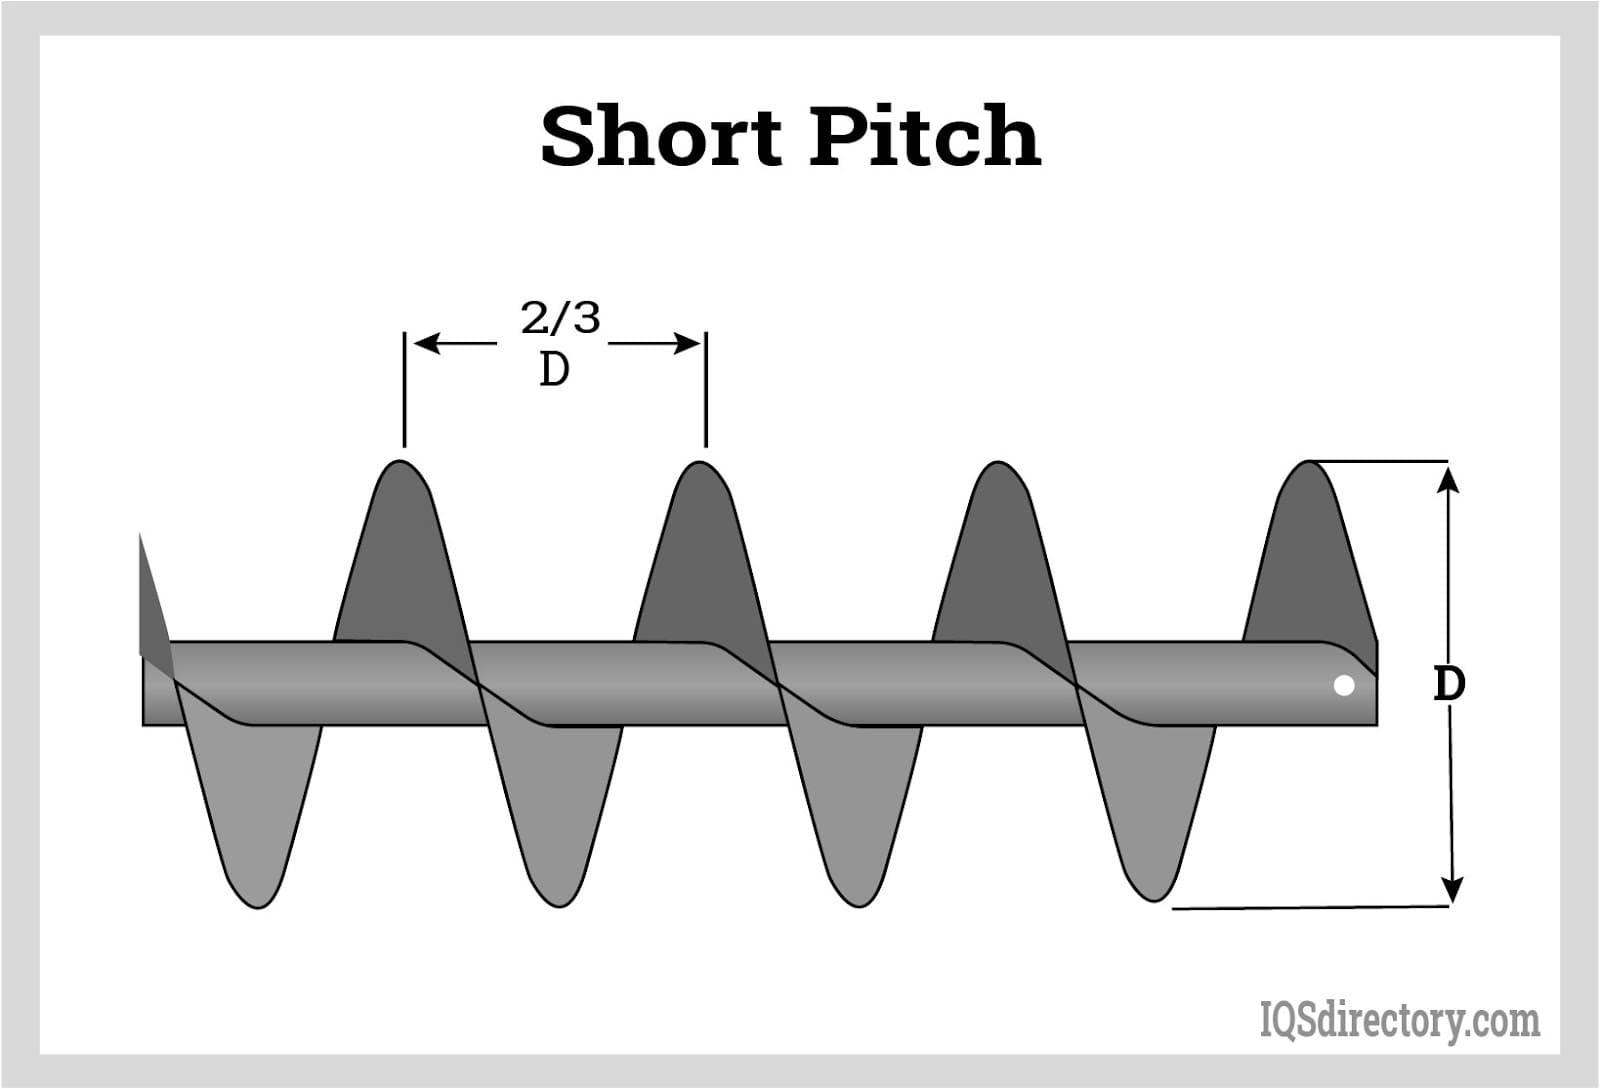 Short Pitch